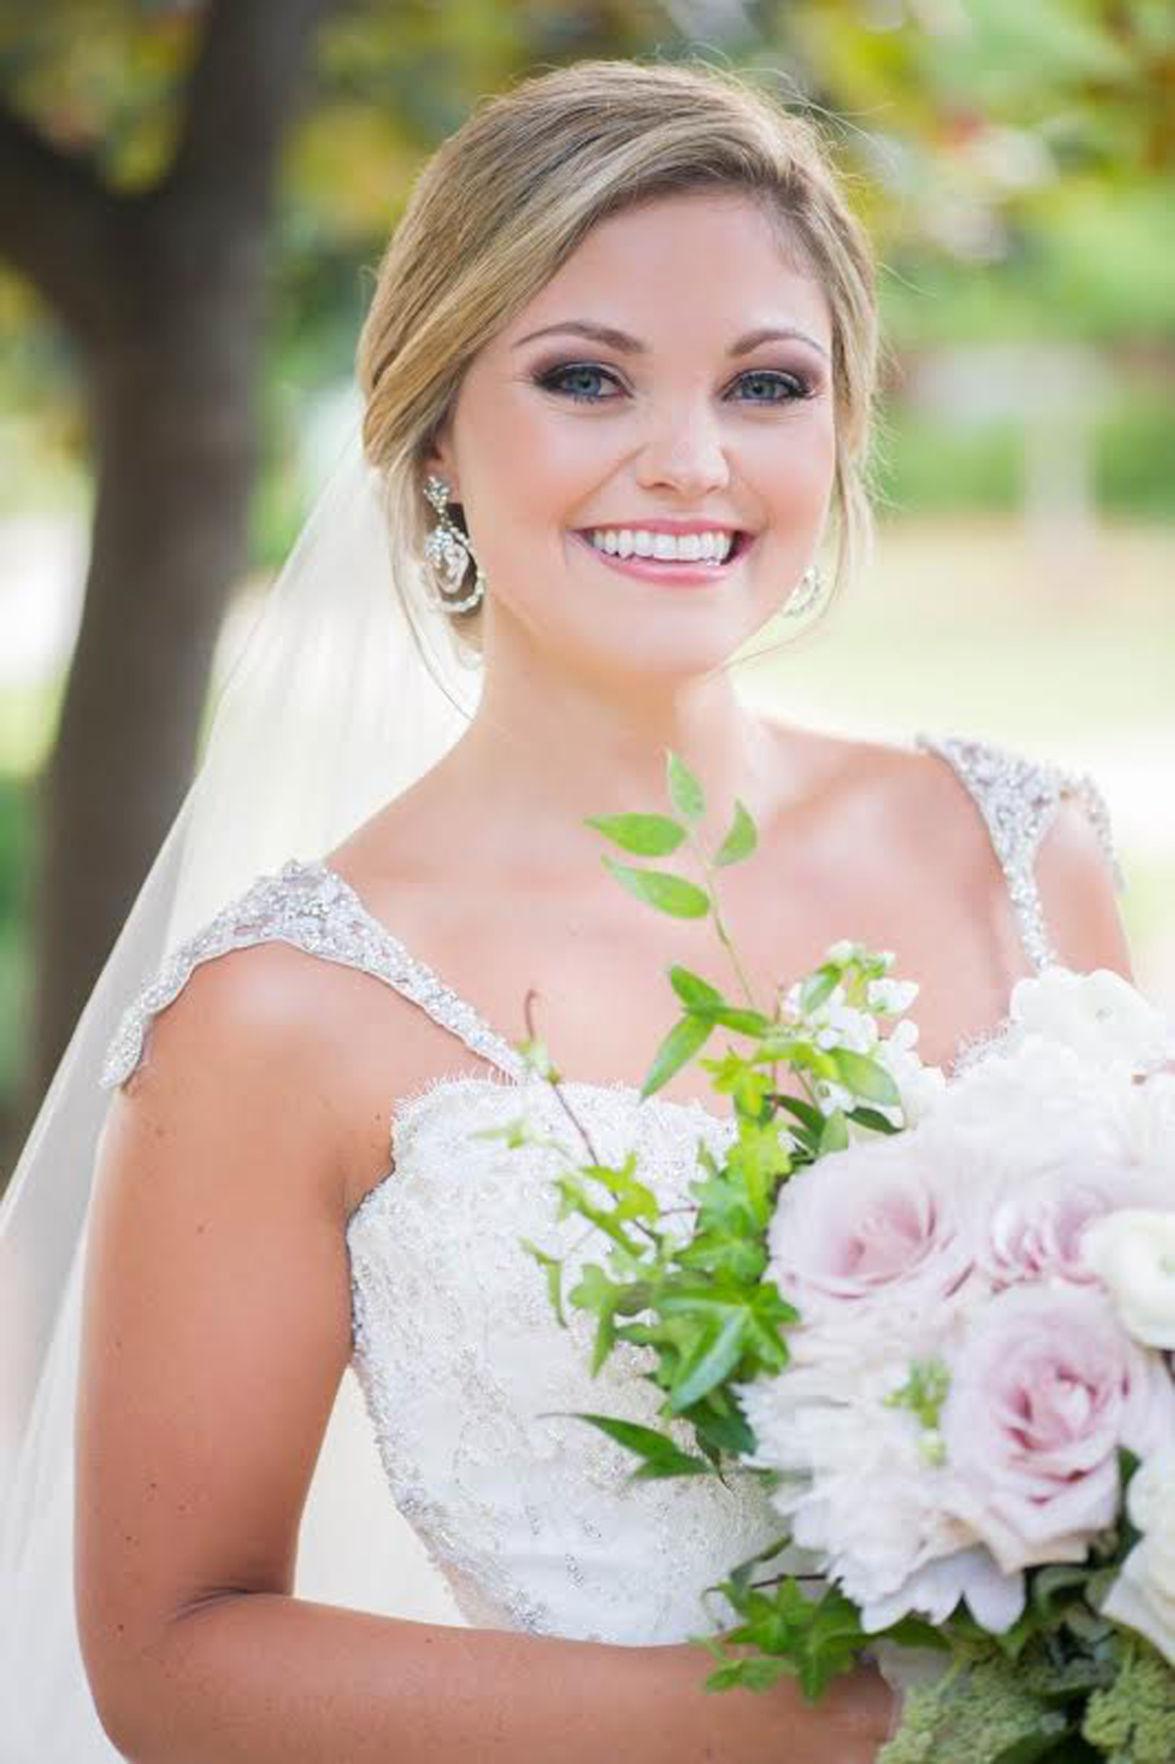 Mrs. Kyle Whitfield Wilson